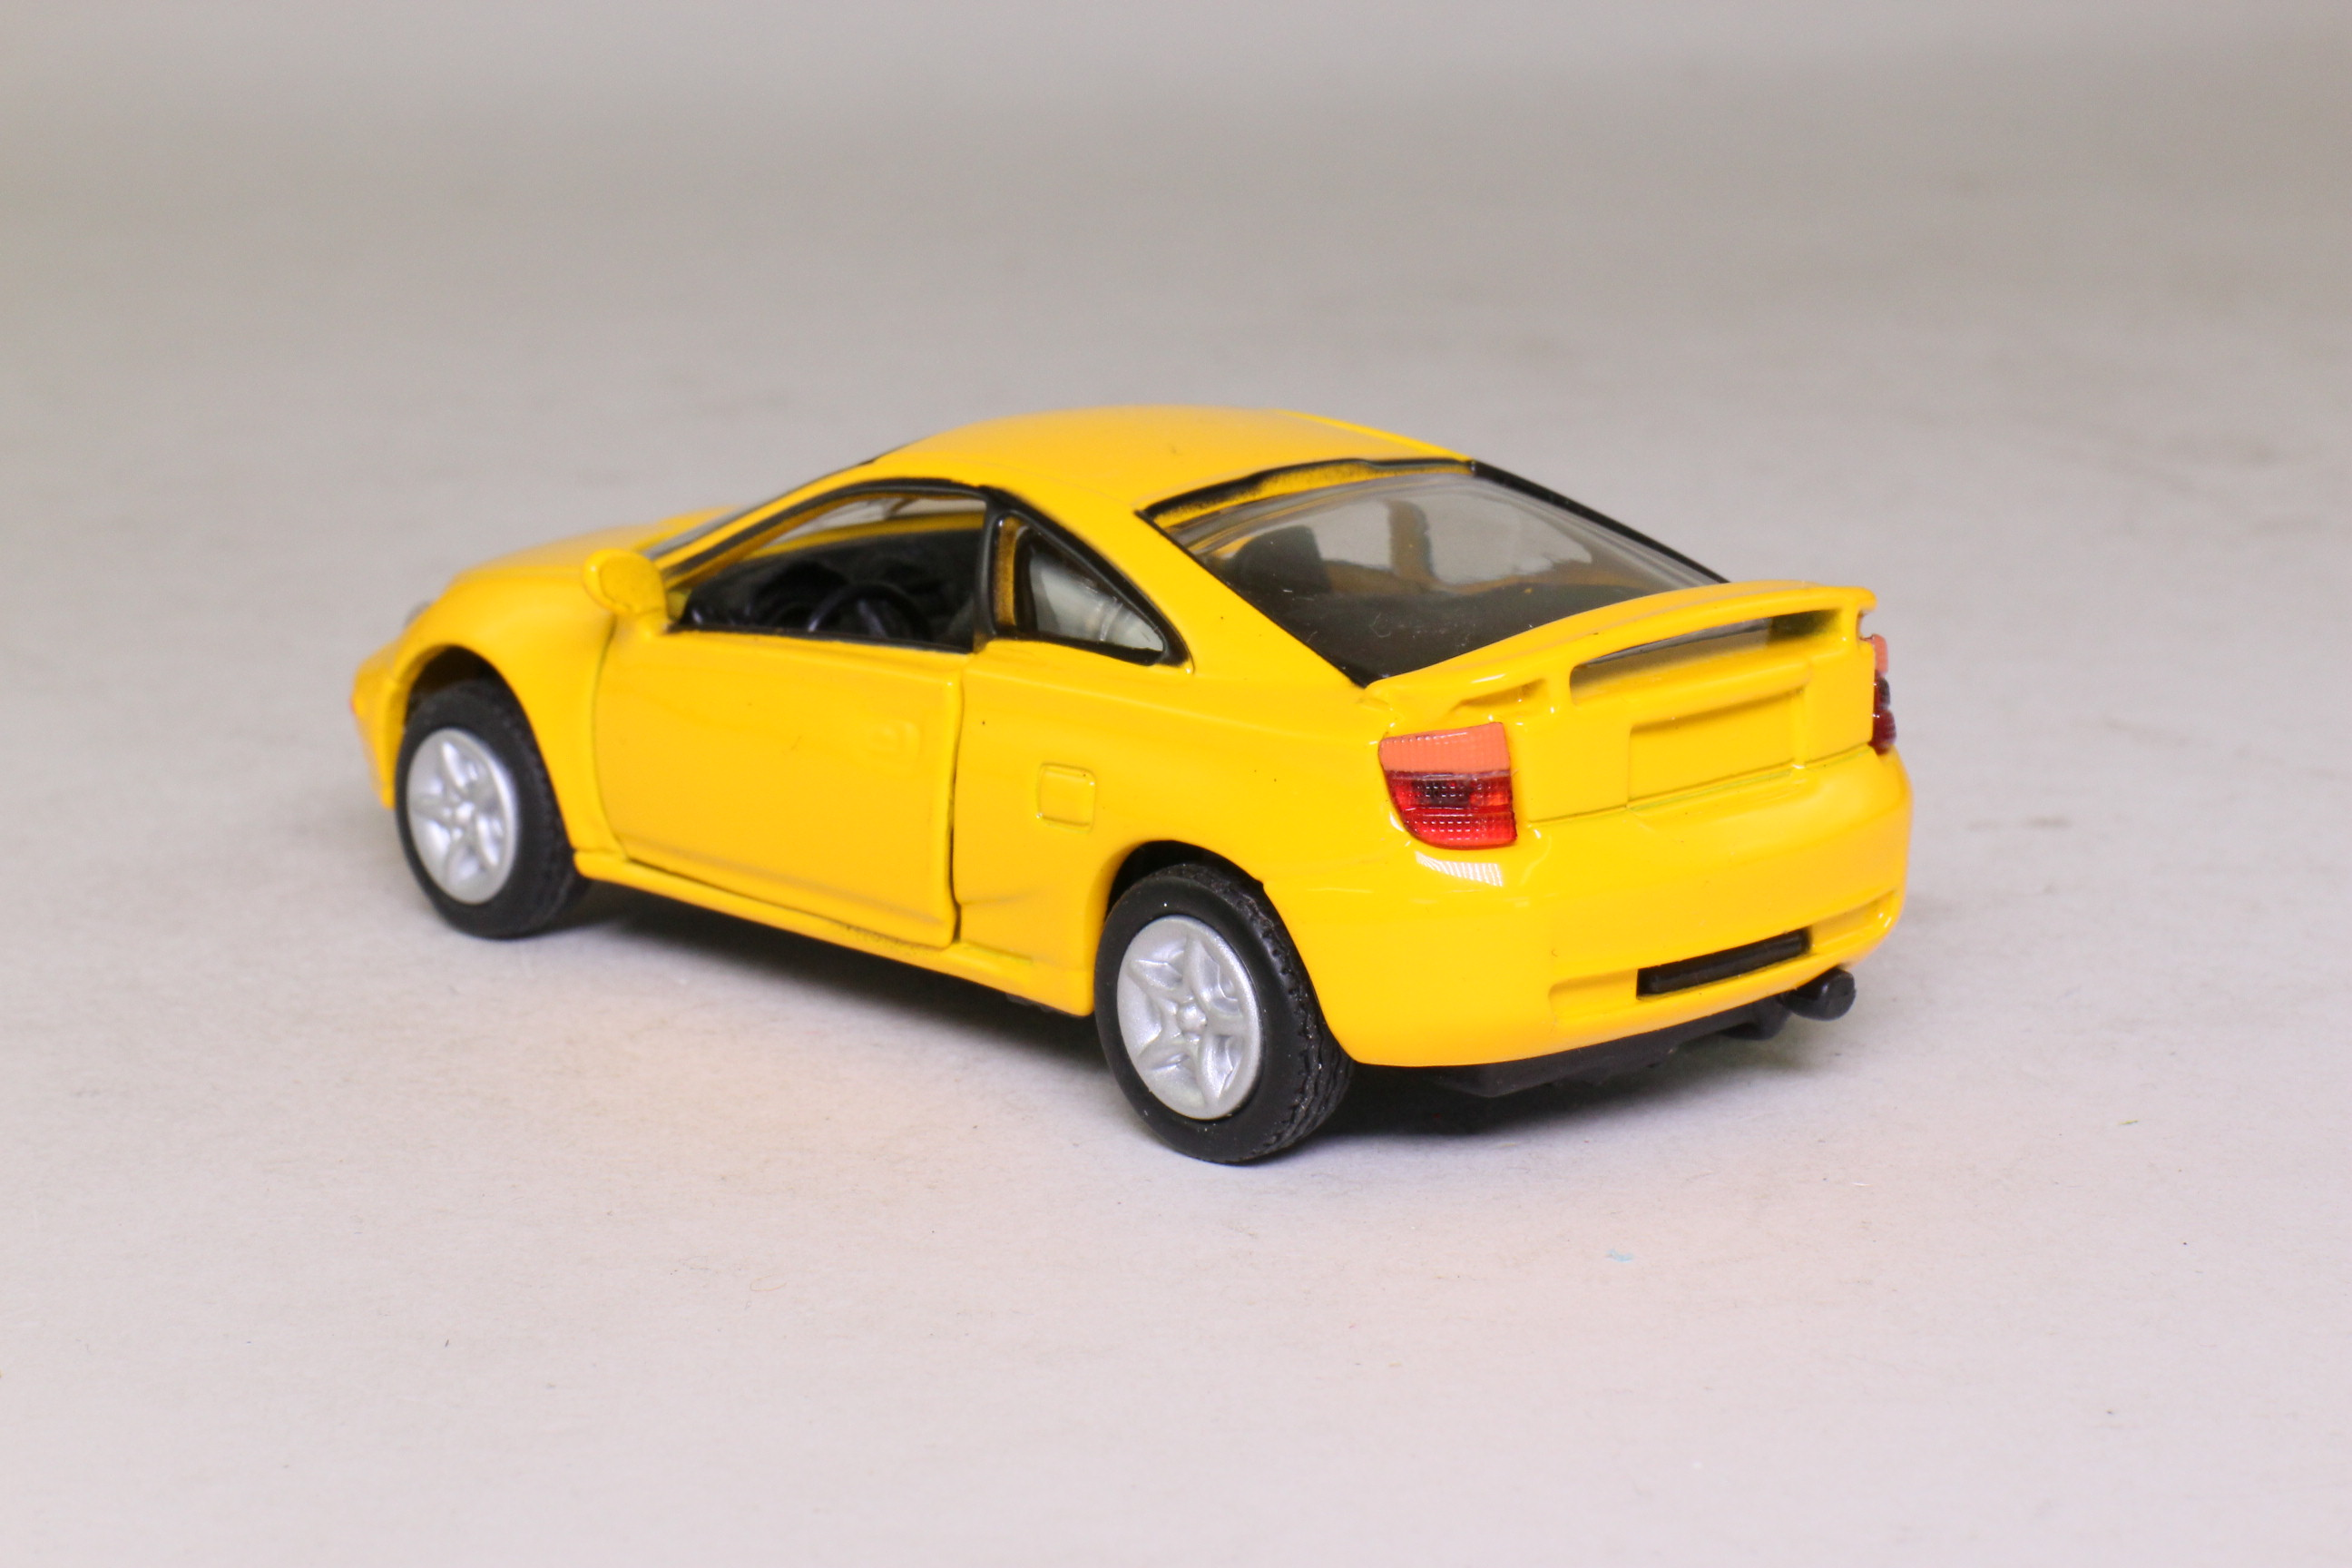 1999 toyota celica metallic yellow 1 43 scale very good. Black Bedroom Furniture Sets. Home Design Ideas